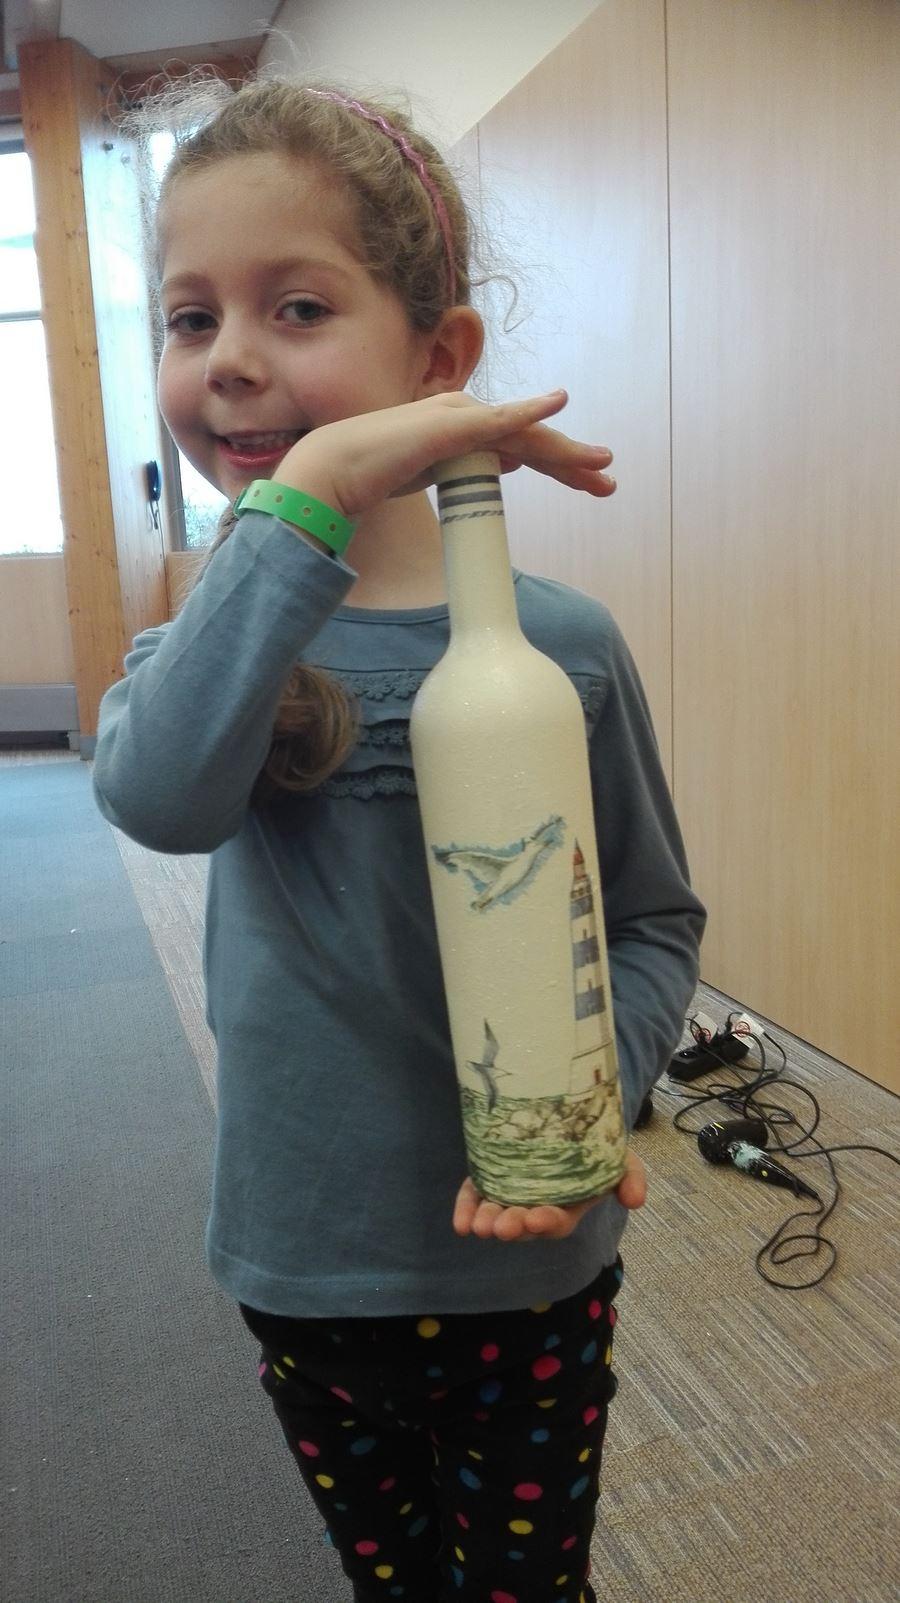 ozdobiona butelka podczas ferii